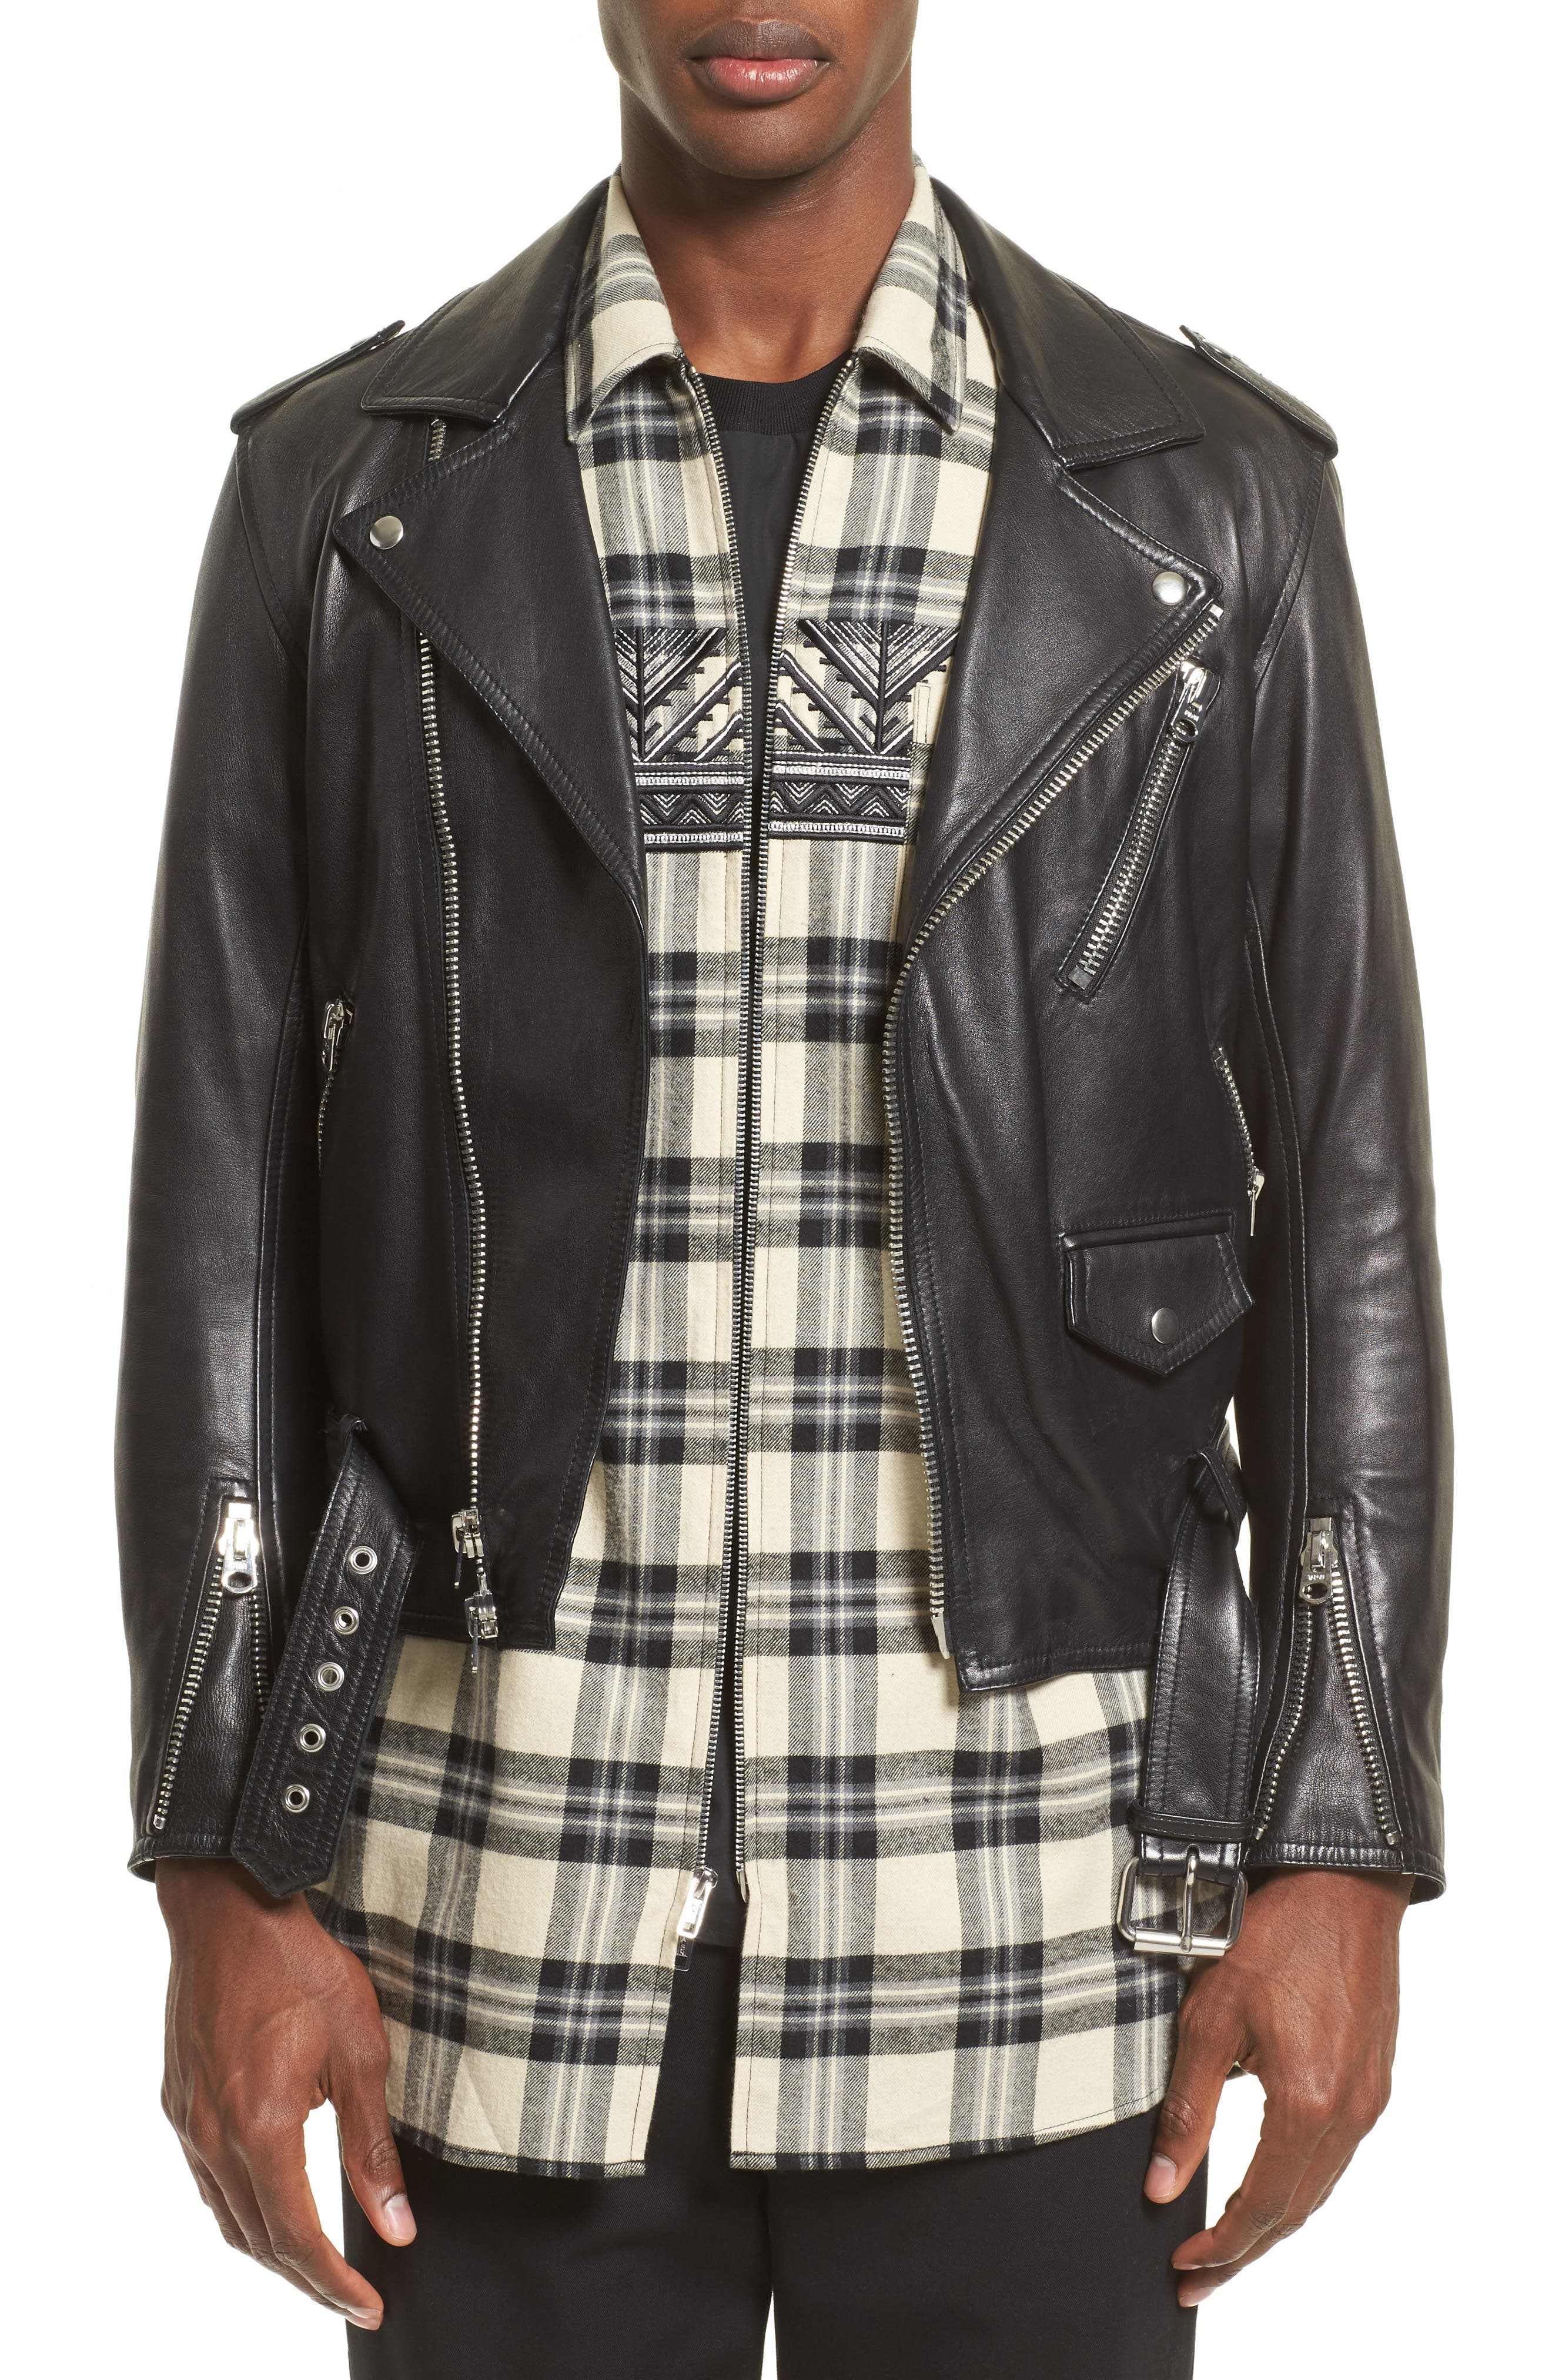 3.1 Phillip Lim Classic Leather Moto Jacket